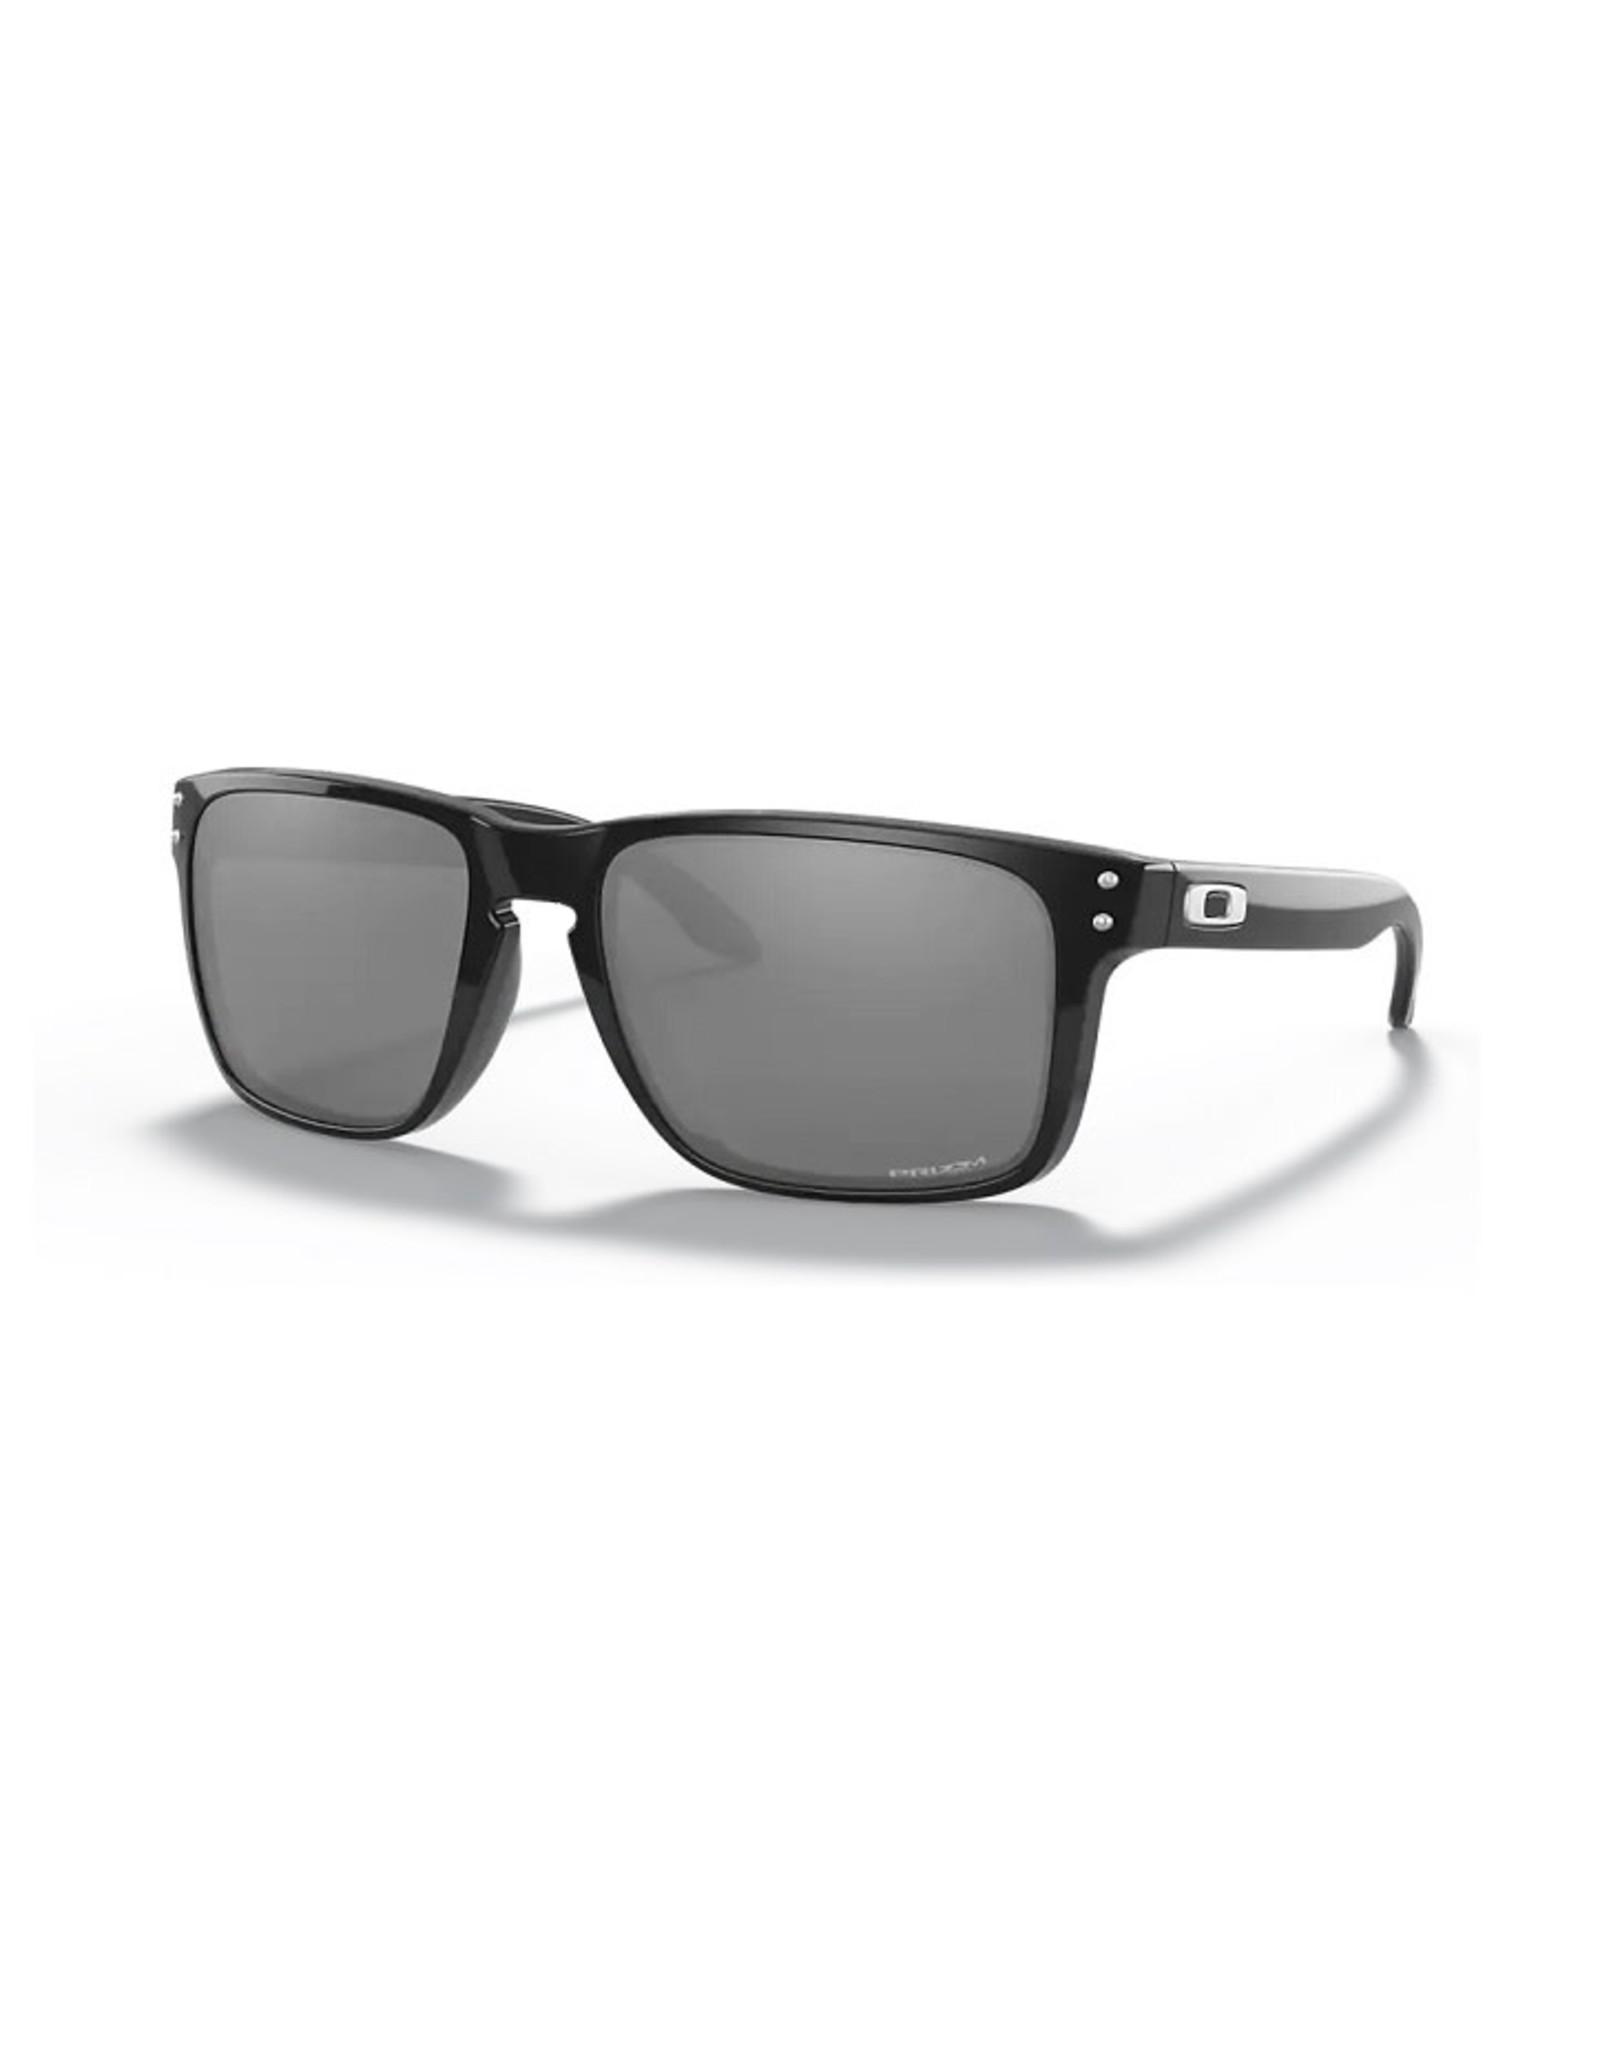 Oakley HOLBROOK XL Polished Black, Prizm Black Iridium